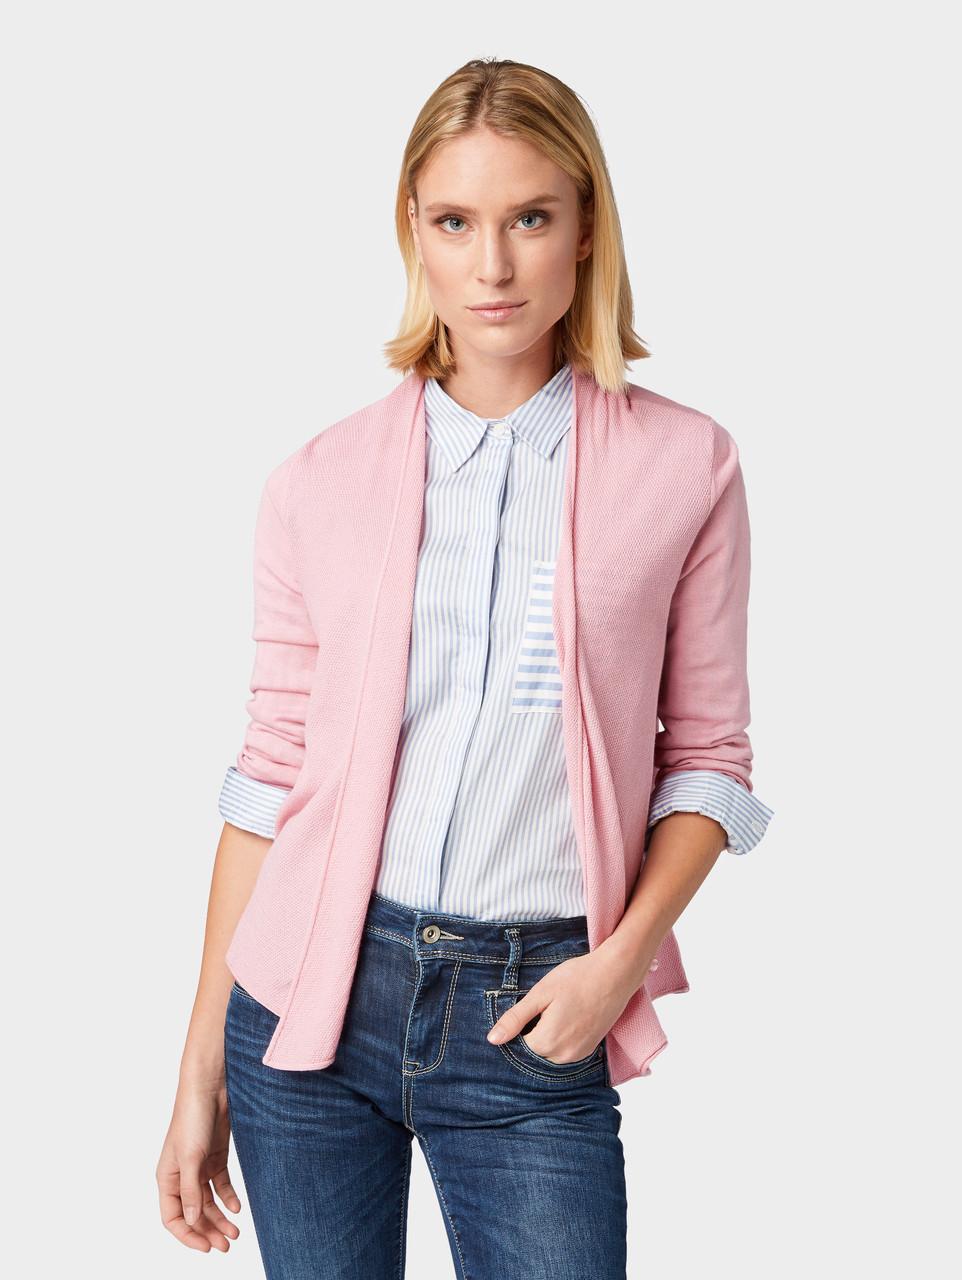 Кардиган Tom Tailor 1009675 L Розовый